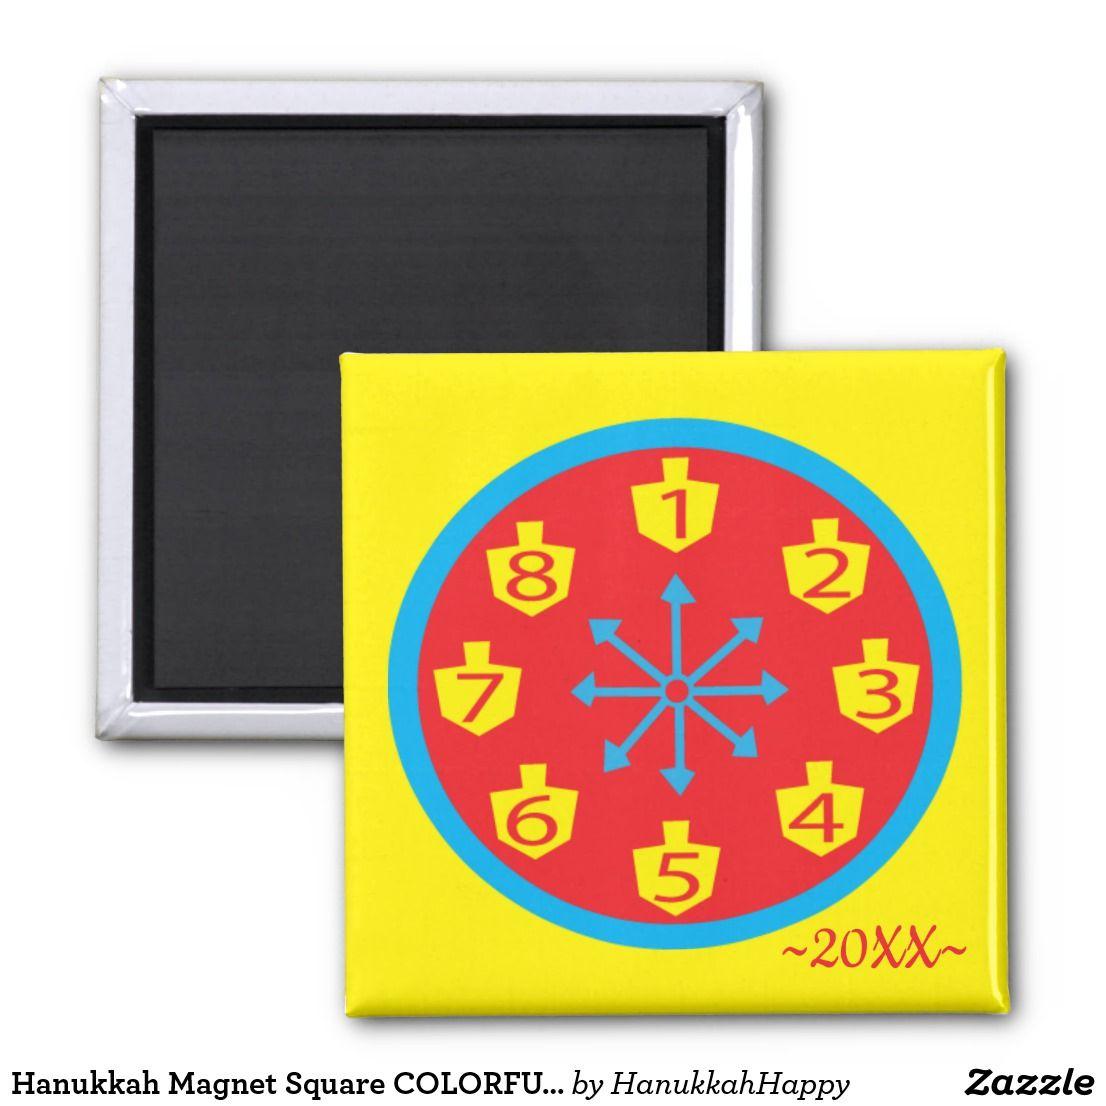 Hanukkah Magnet Square Colorful Crazy 8 Clock